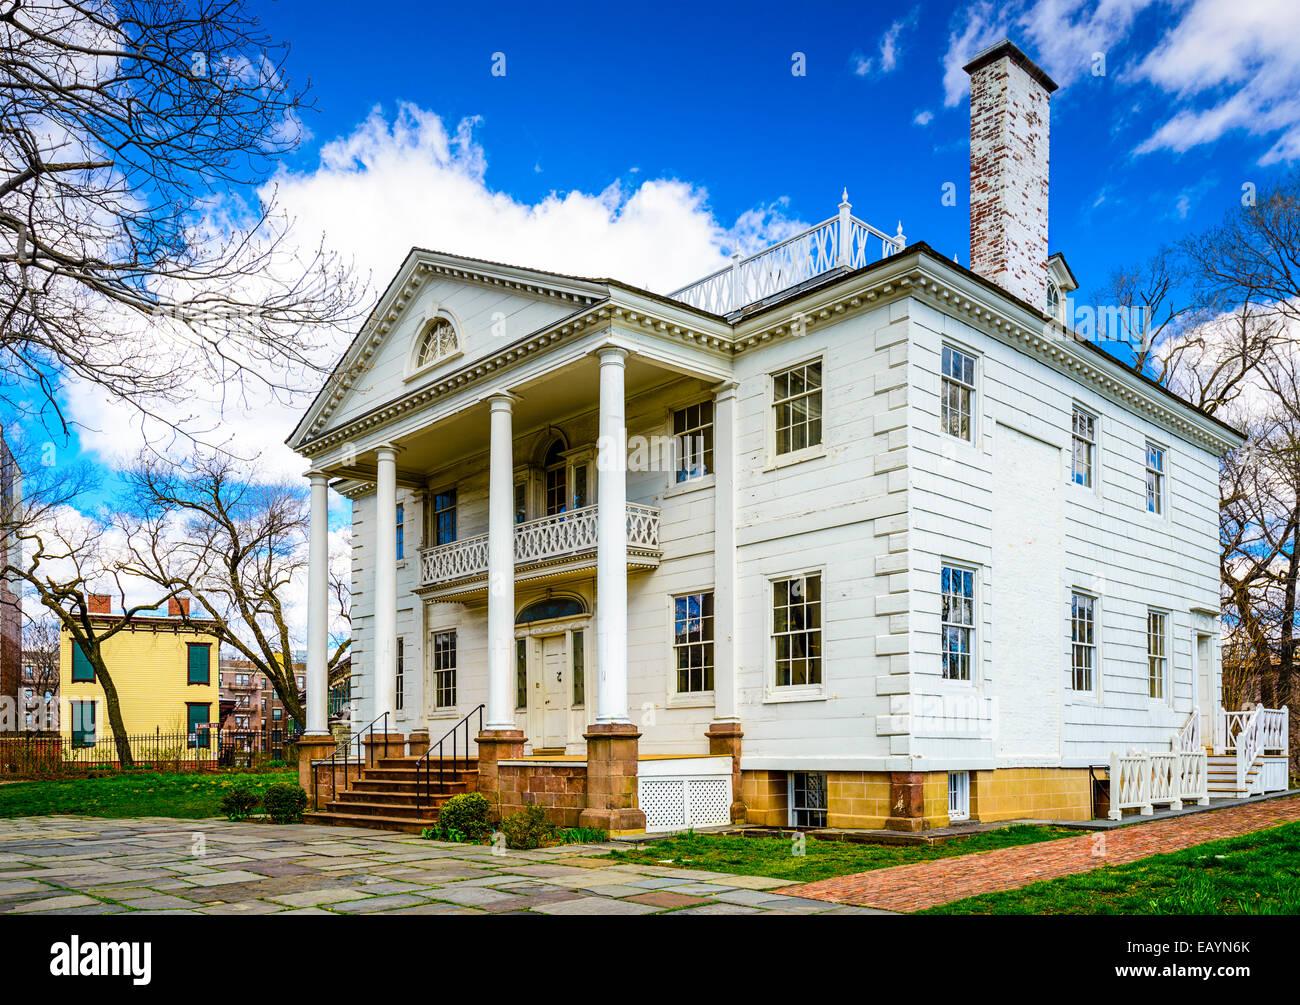 Historique Le Manoir Morris-Jumel dans Roger Morris Park, Washington Heights, New York, New York, USA. Photo Stock